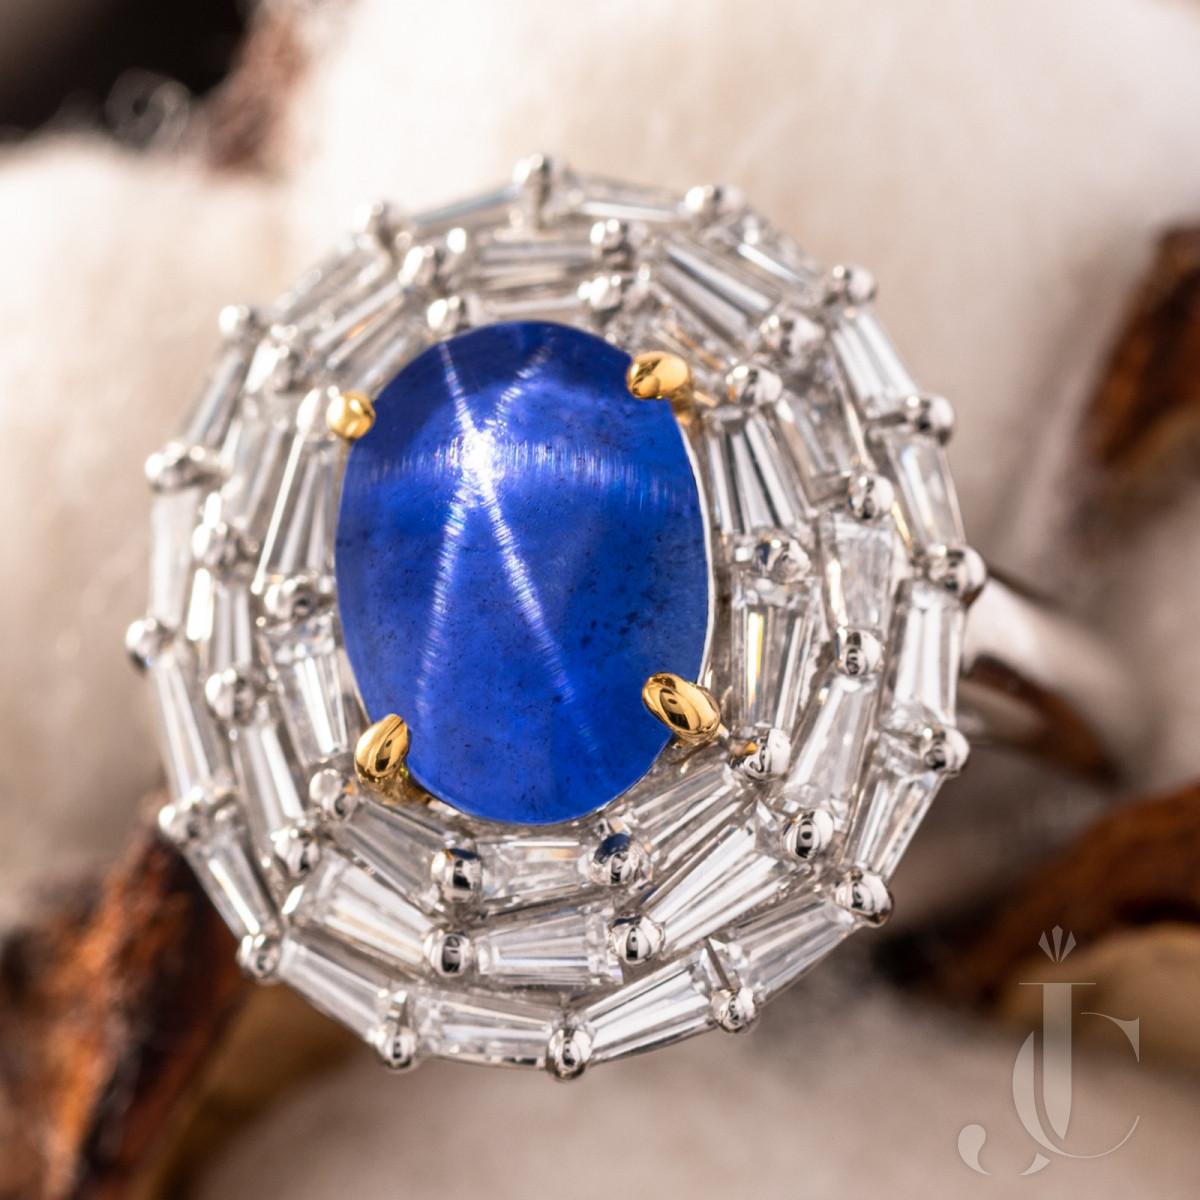 Platinum 3.46 carat star sapphire Diamond ring